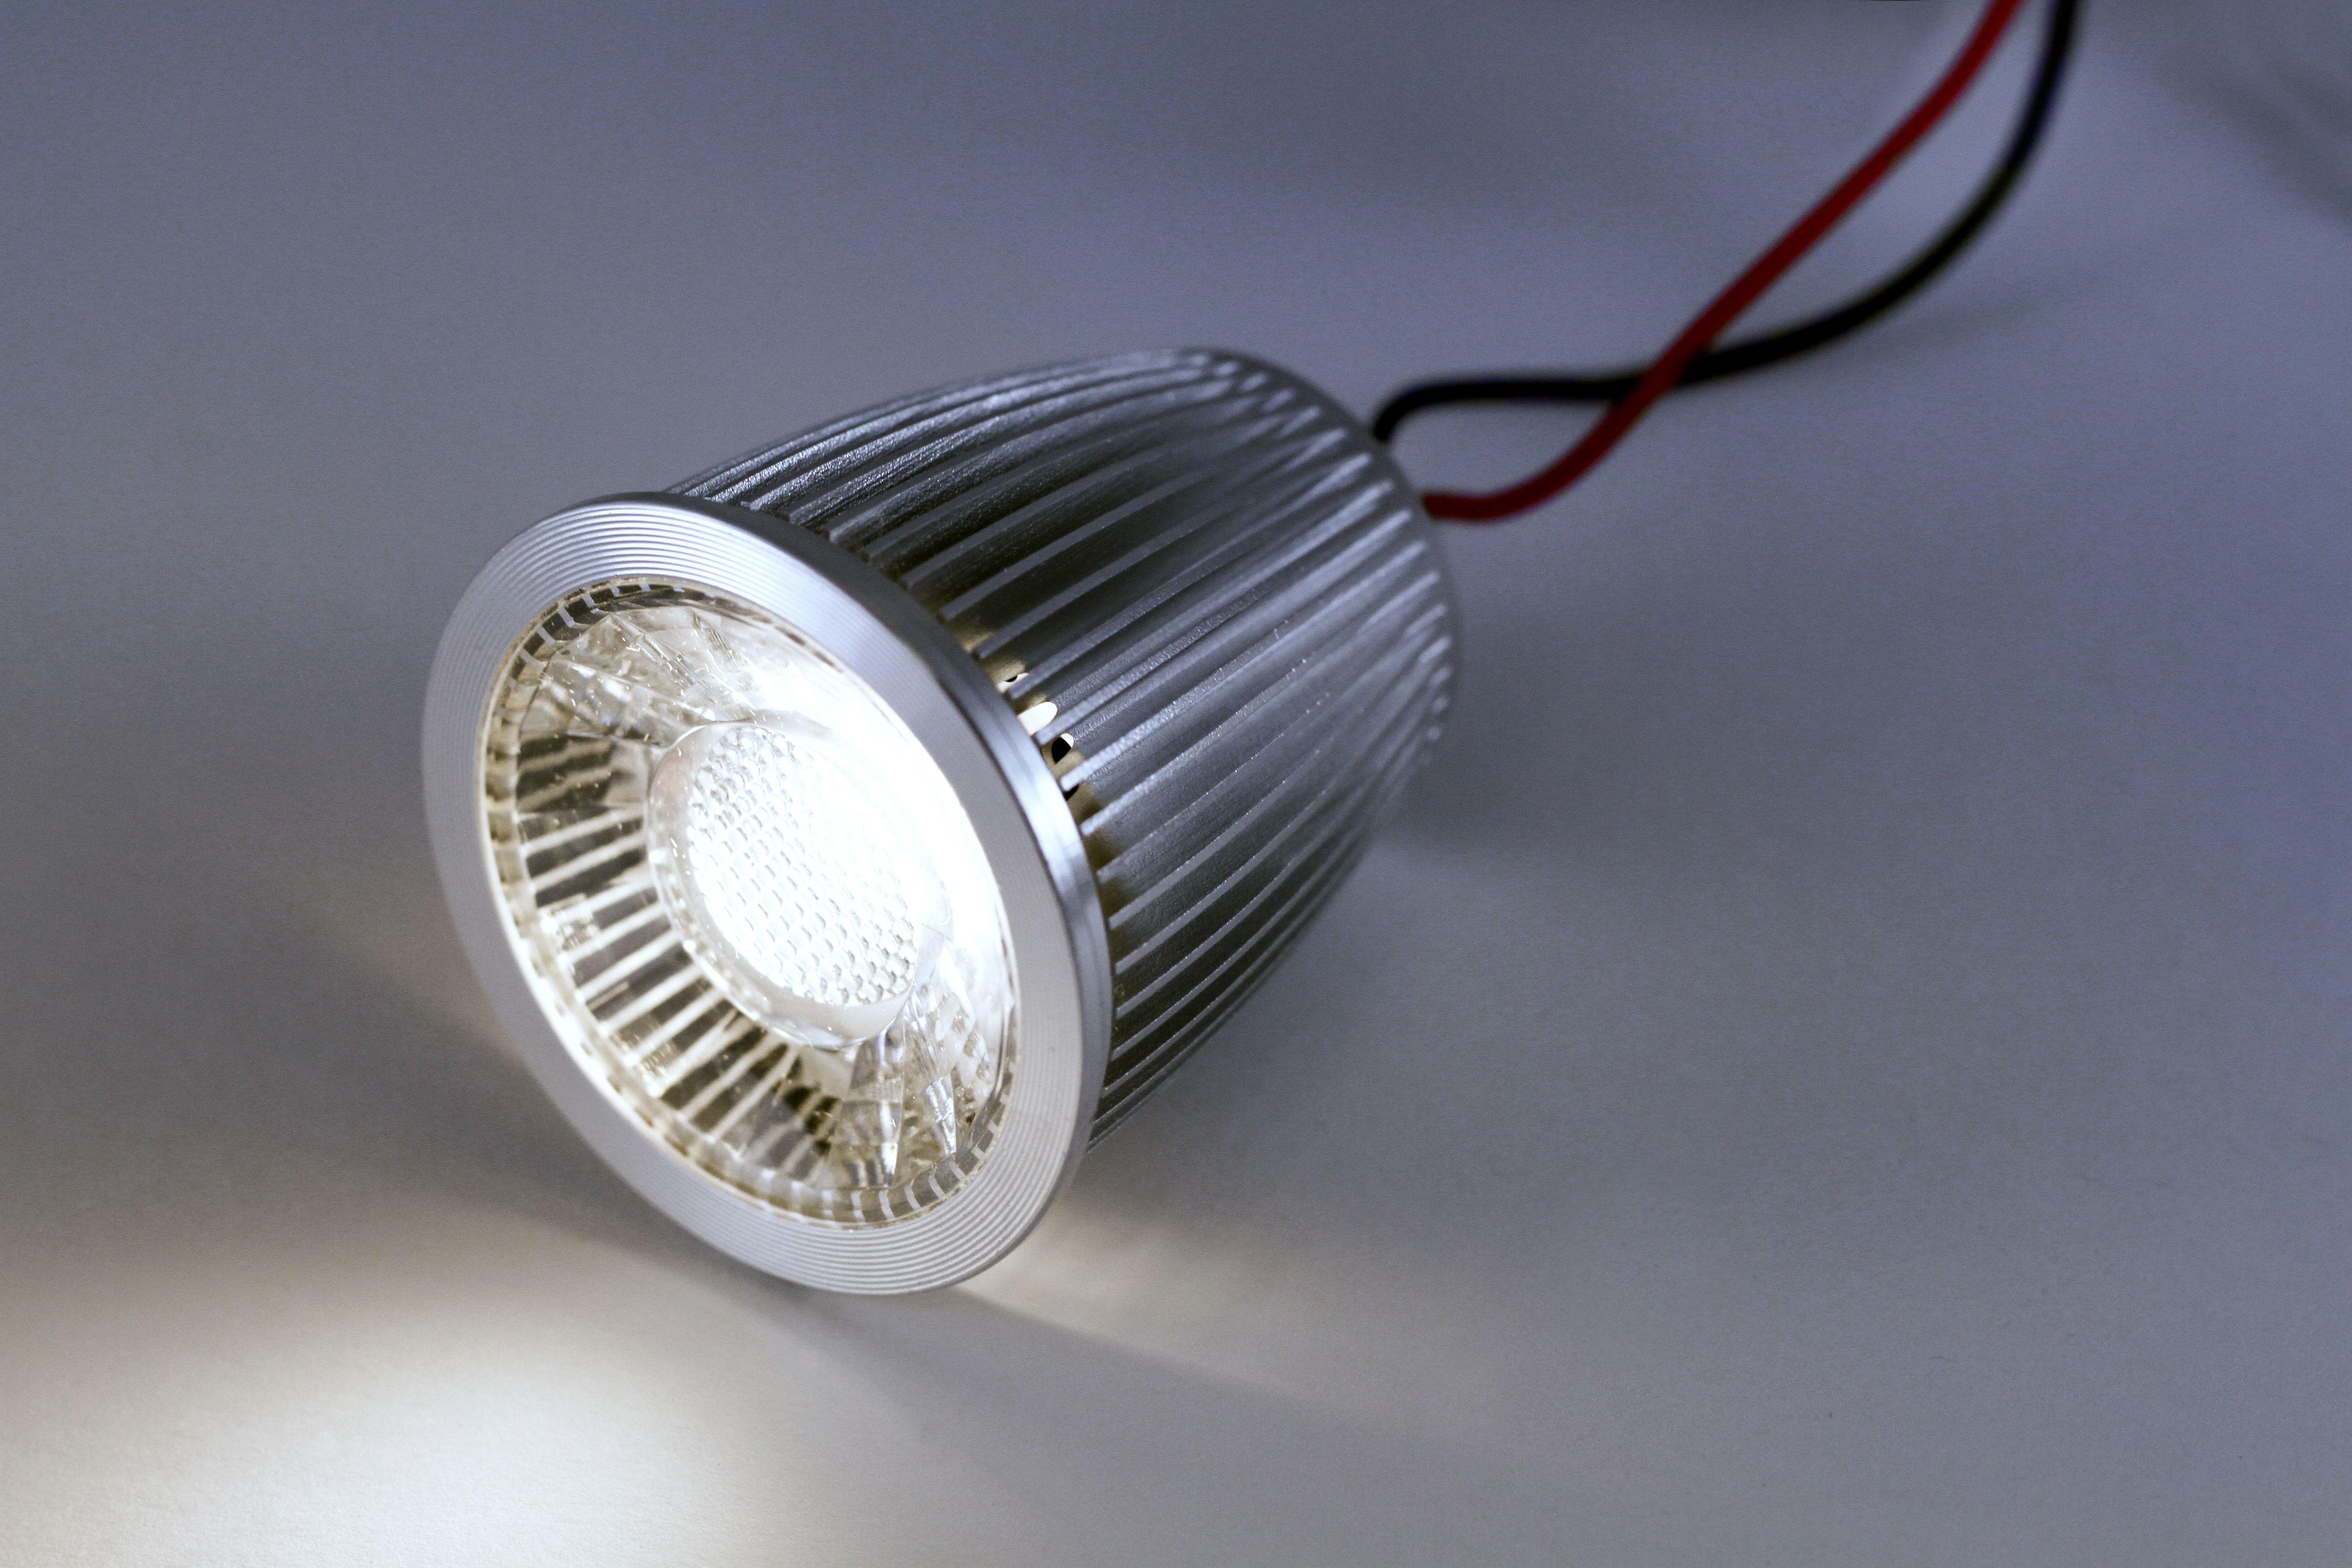 Constaled 30939 Led Spot Mr16 6w 24v Dc 2850k 25 Cri 92 Online Kaufen Im Voltus Elektro Shop Led Spots Led Beleuchtung